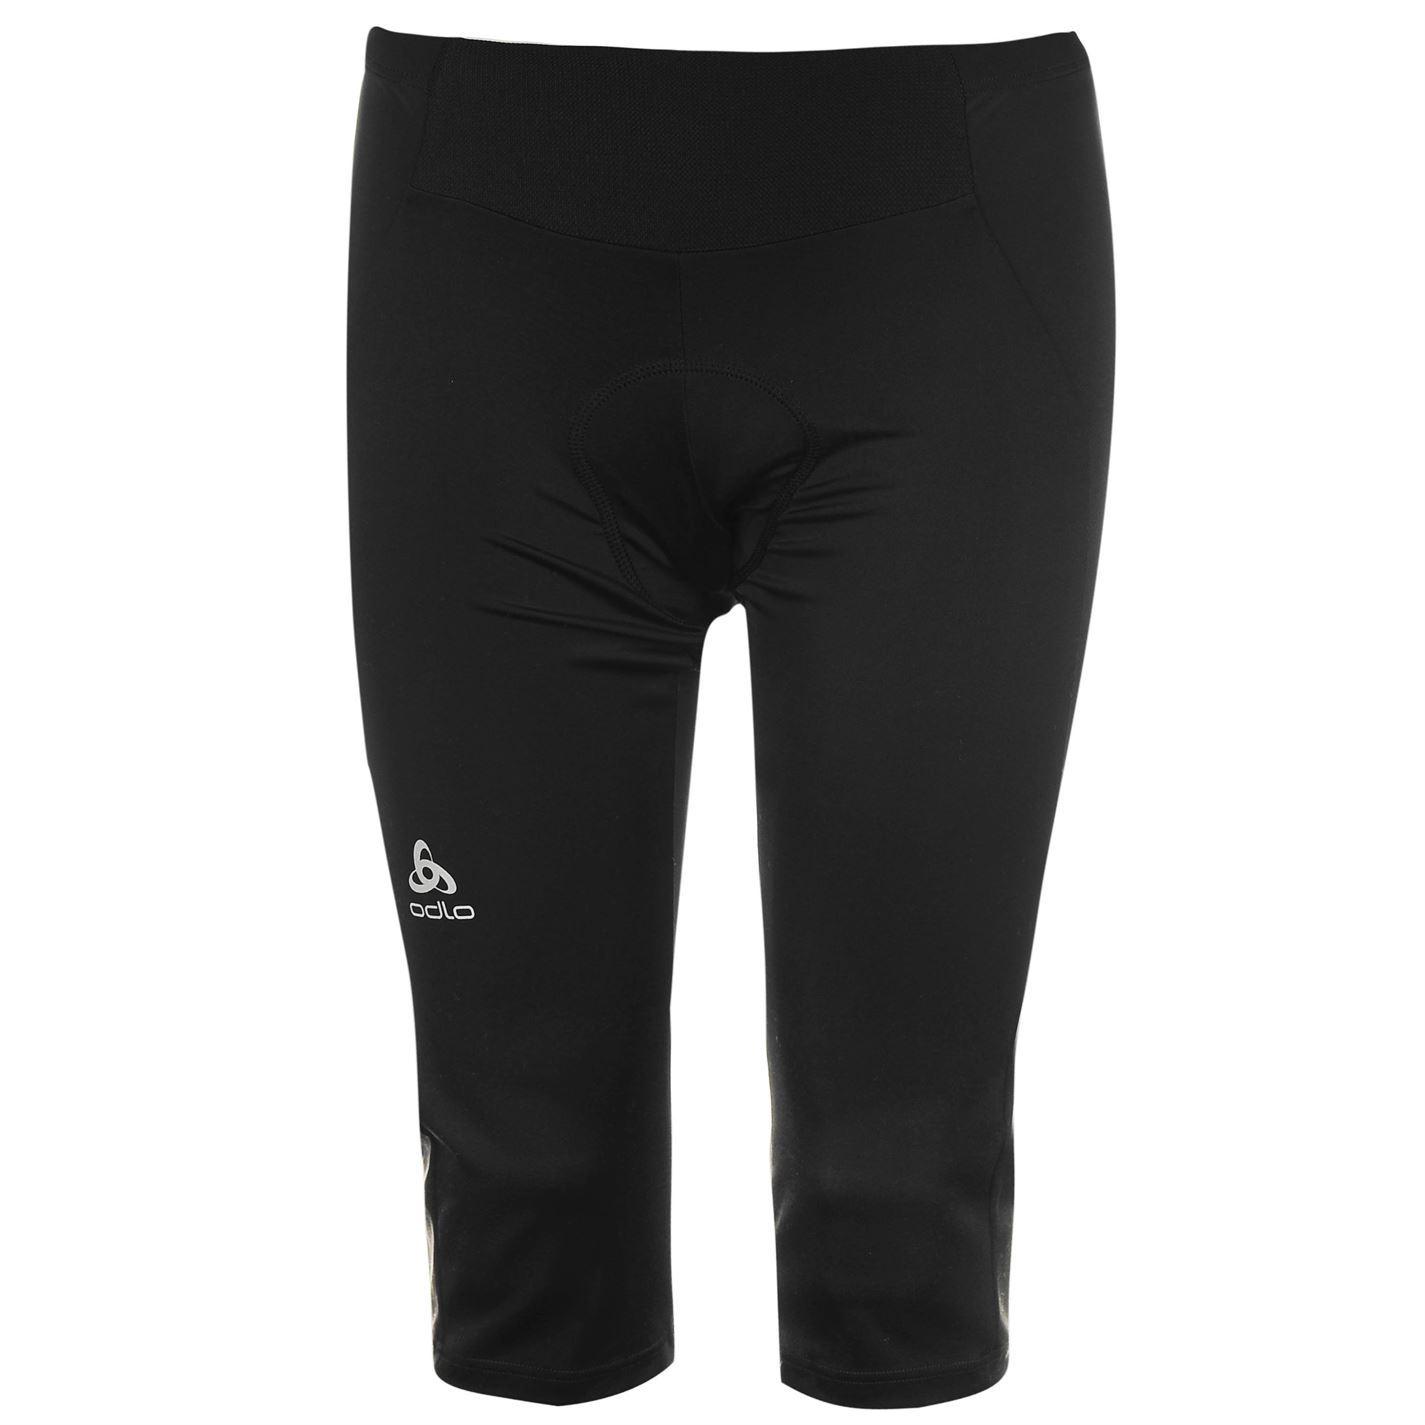 Odlo Womens Julier Cycling Capri Thermoregulation 3 4 Elastic Training  Sports b056d452c0d0